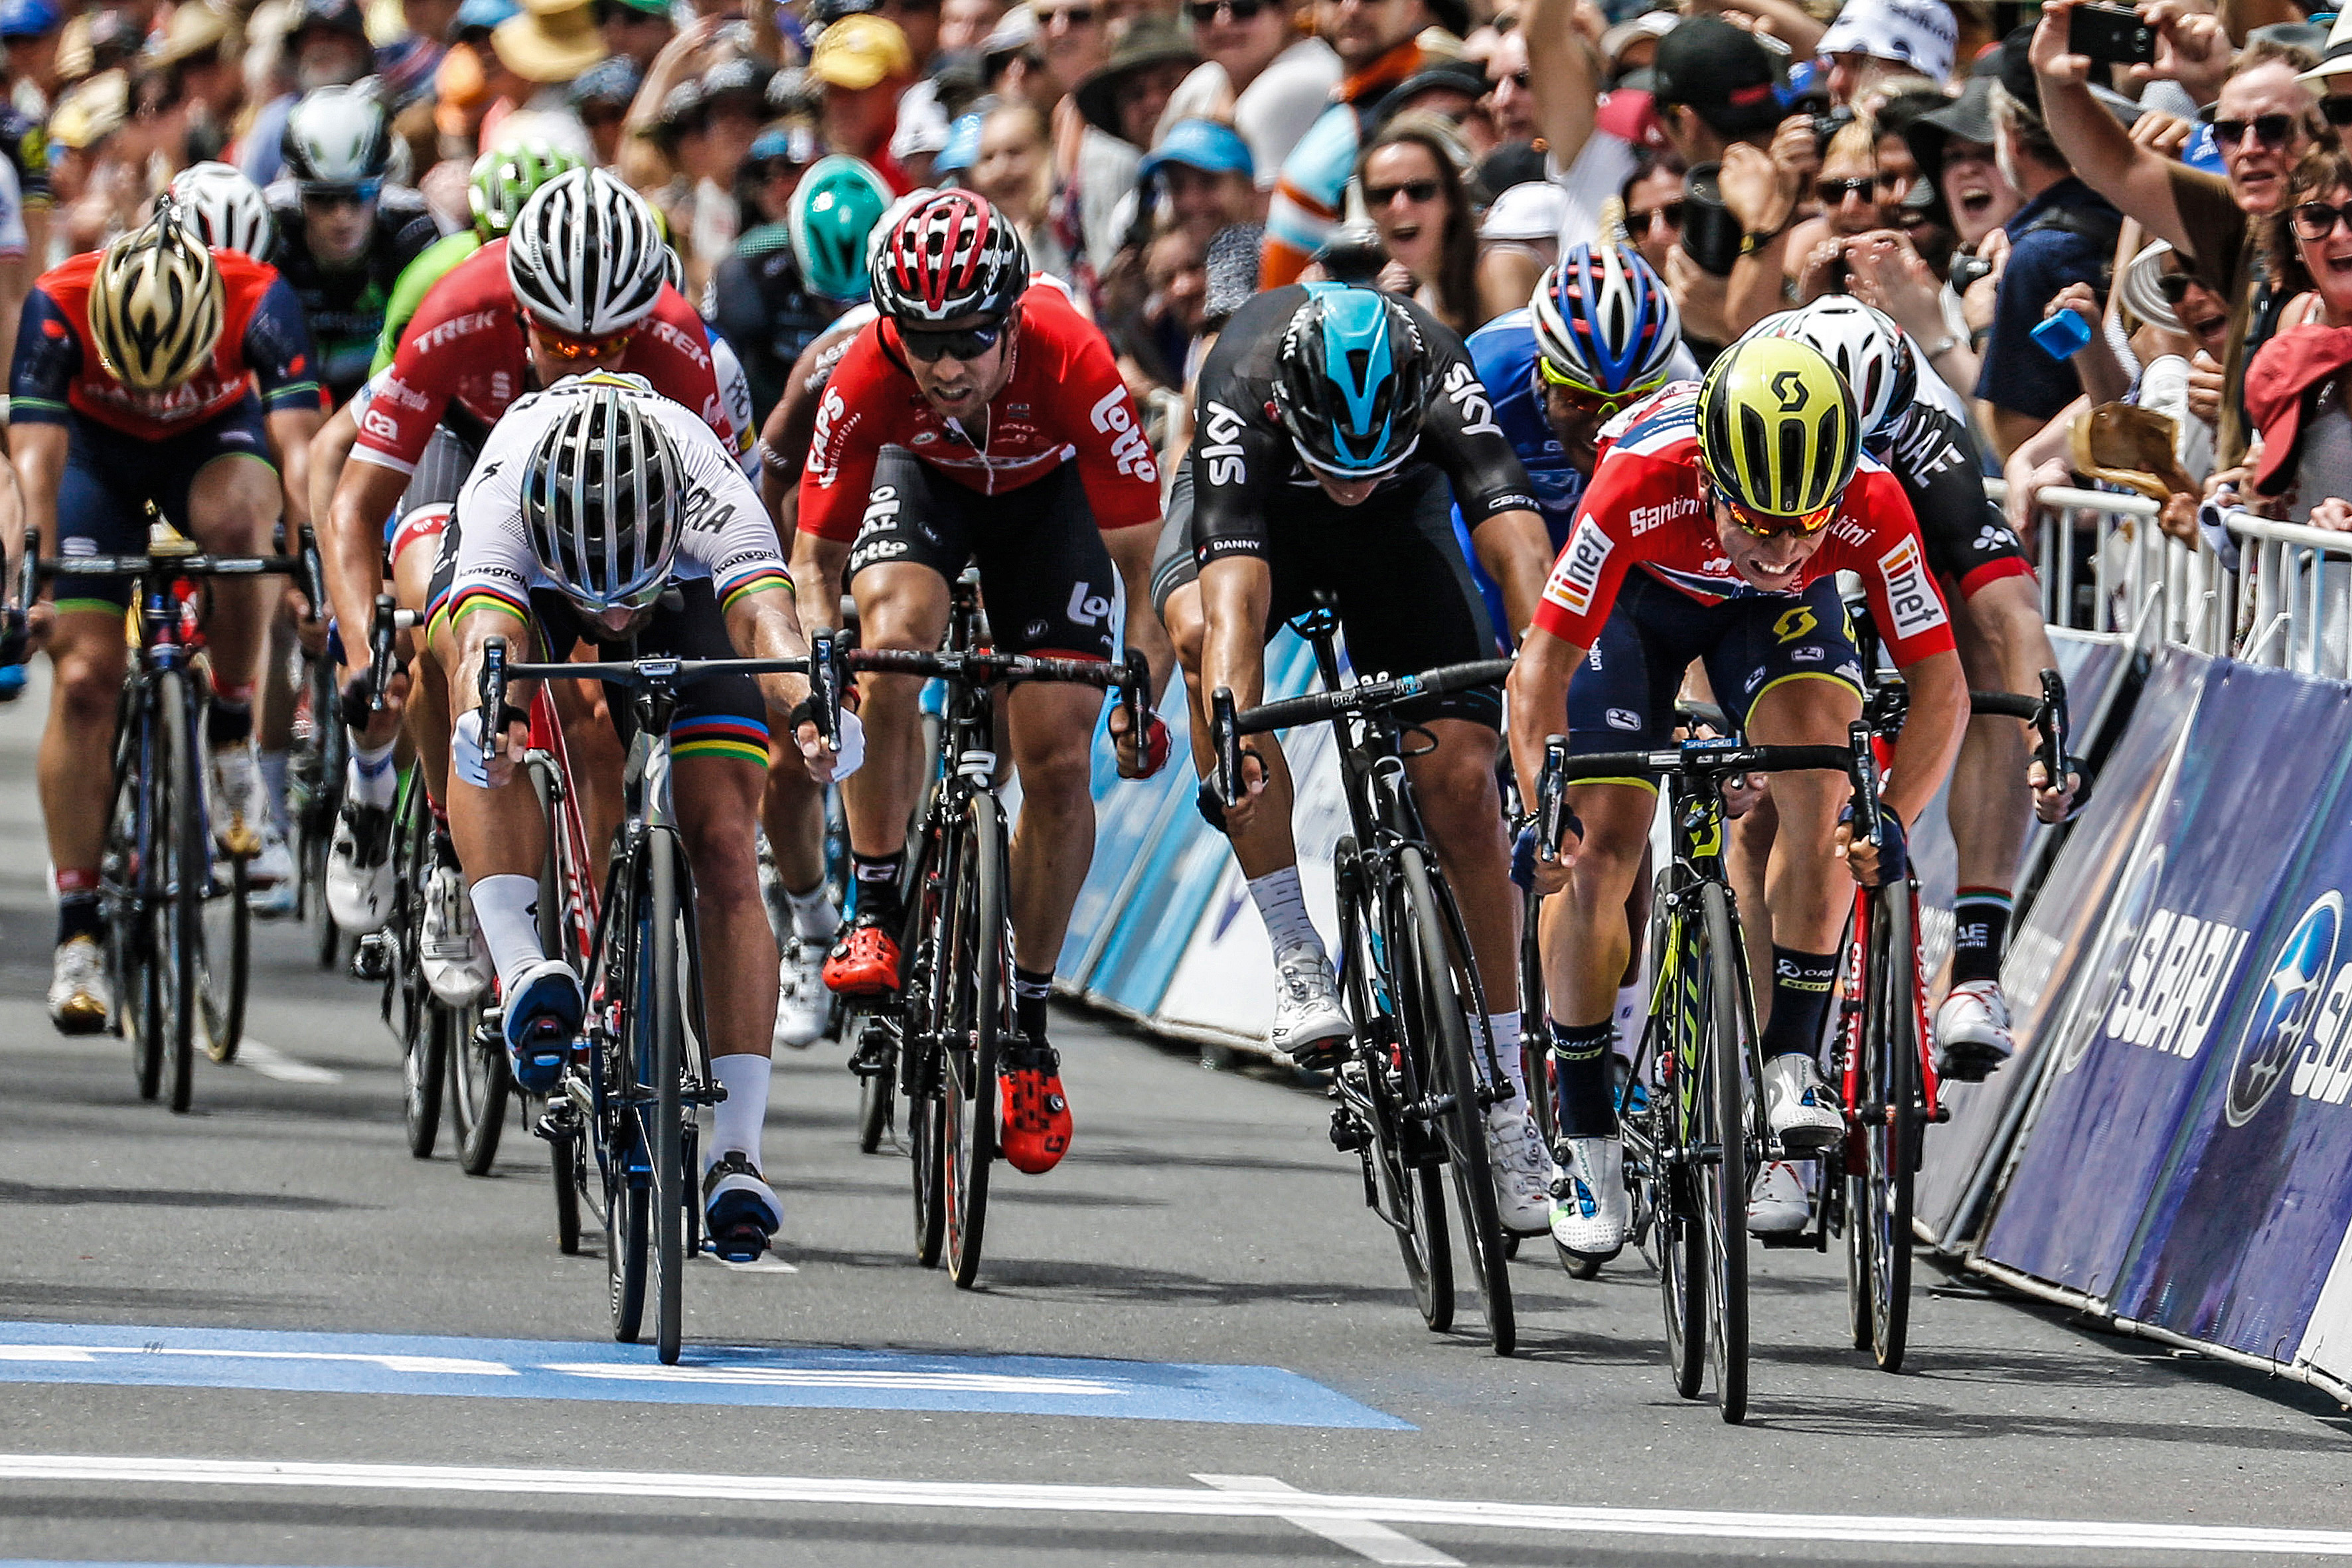 Sagan gets 2nd behind Caleb Ewan (©BORA-hansgrohe / Stiehl Photography)